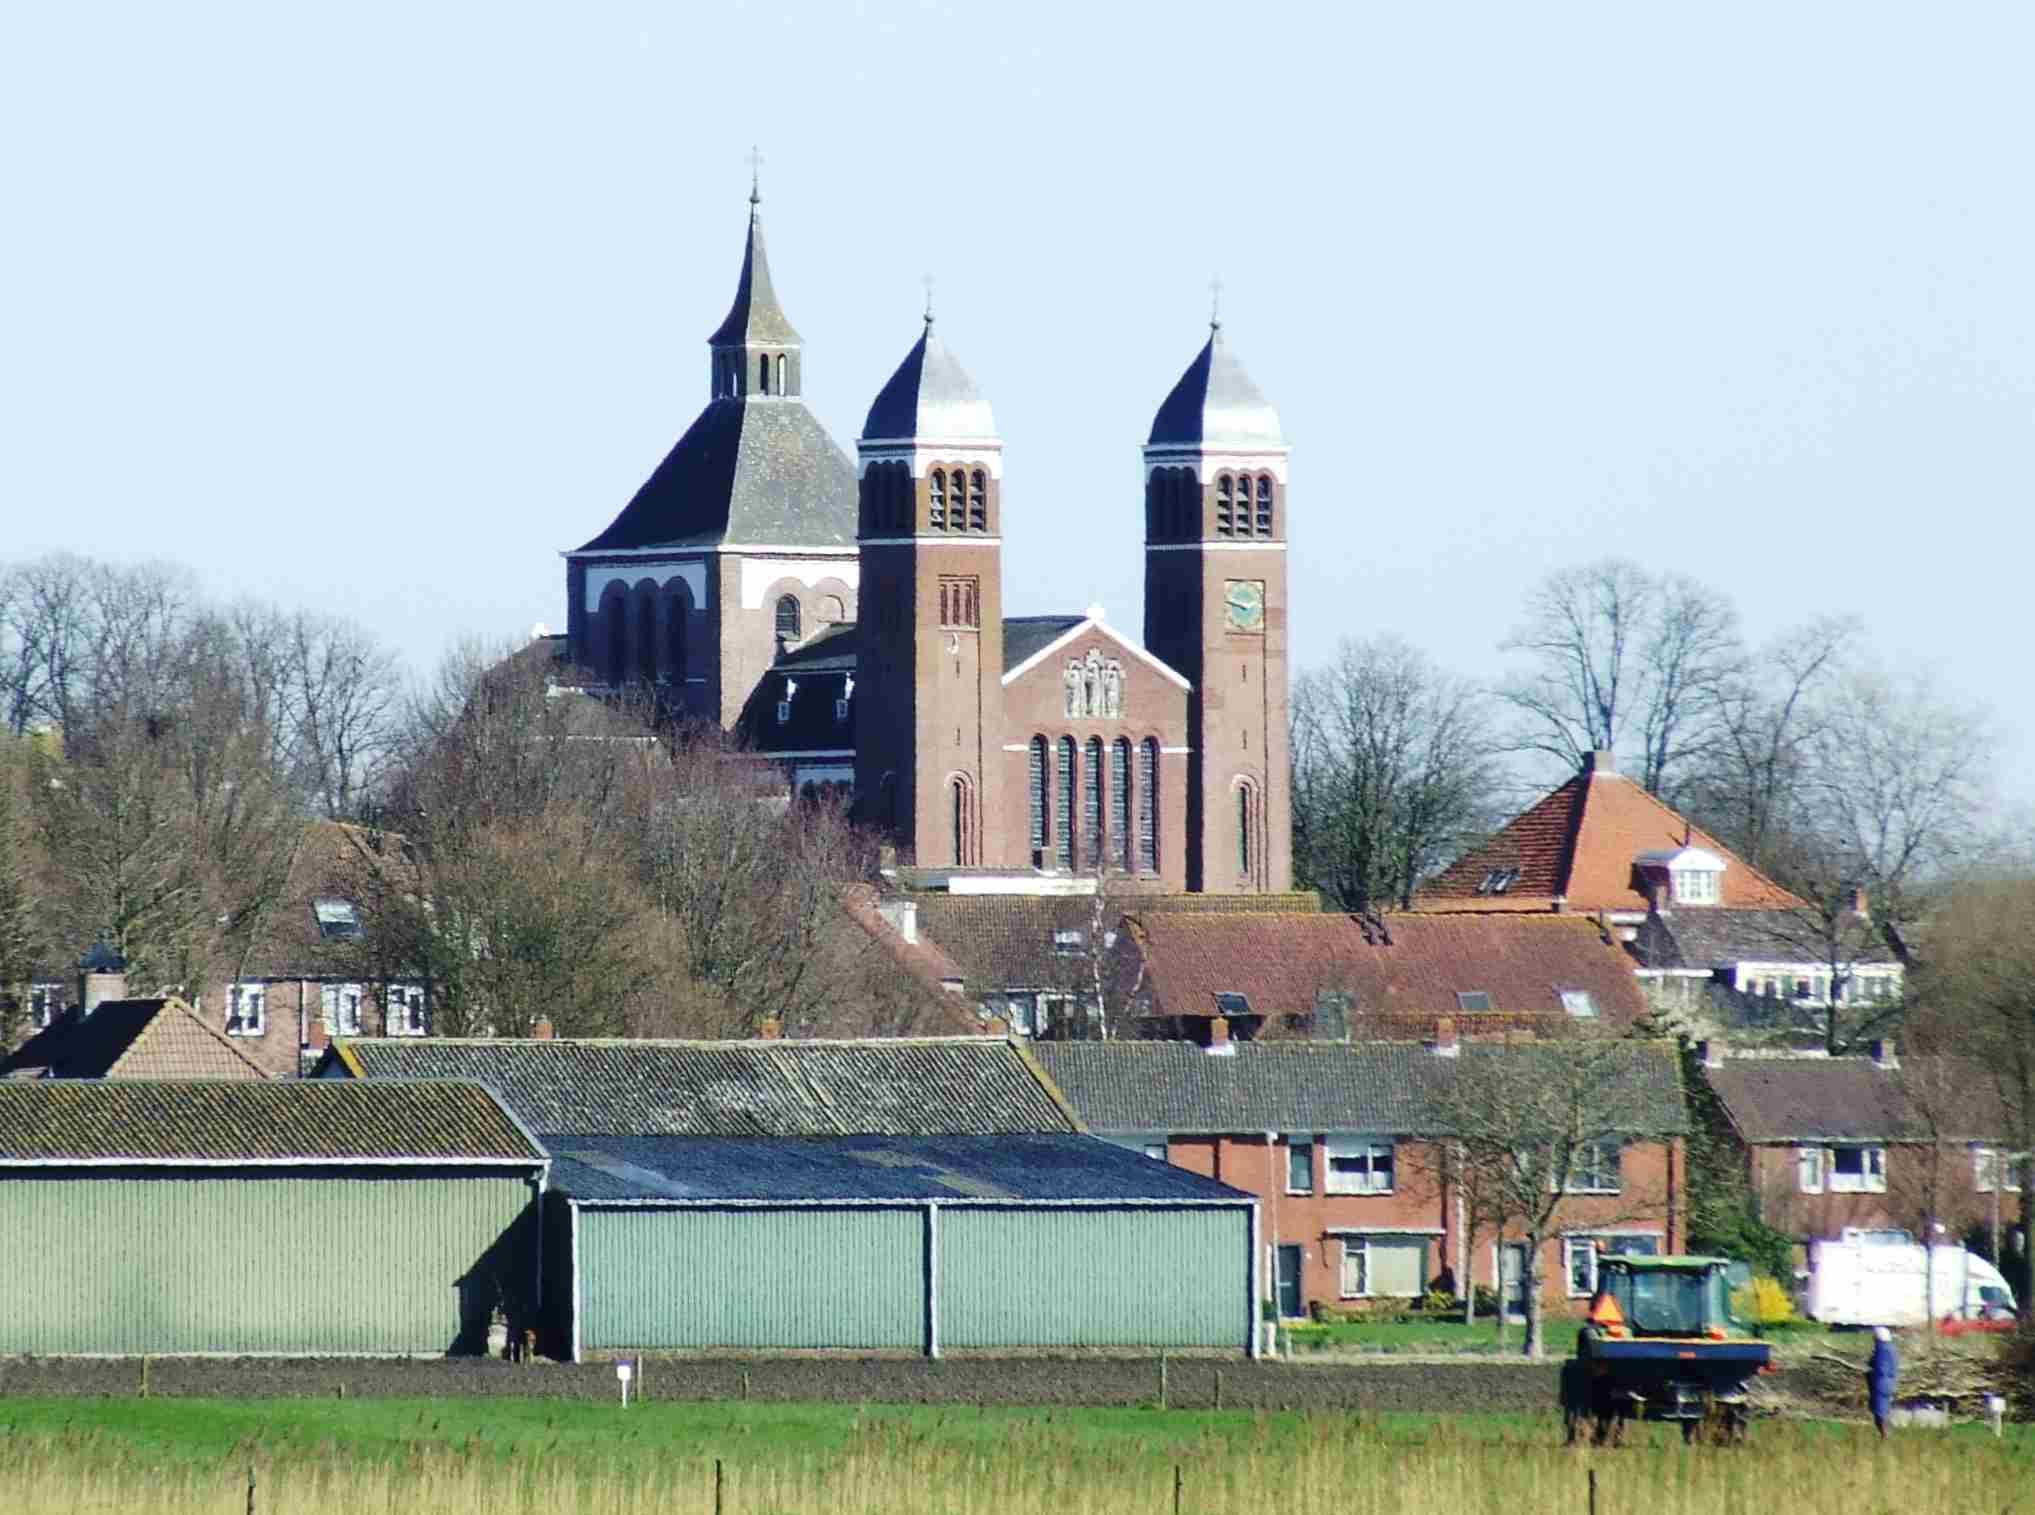 Sint Christoffel Net, Worldwide Chargingnet